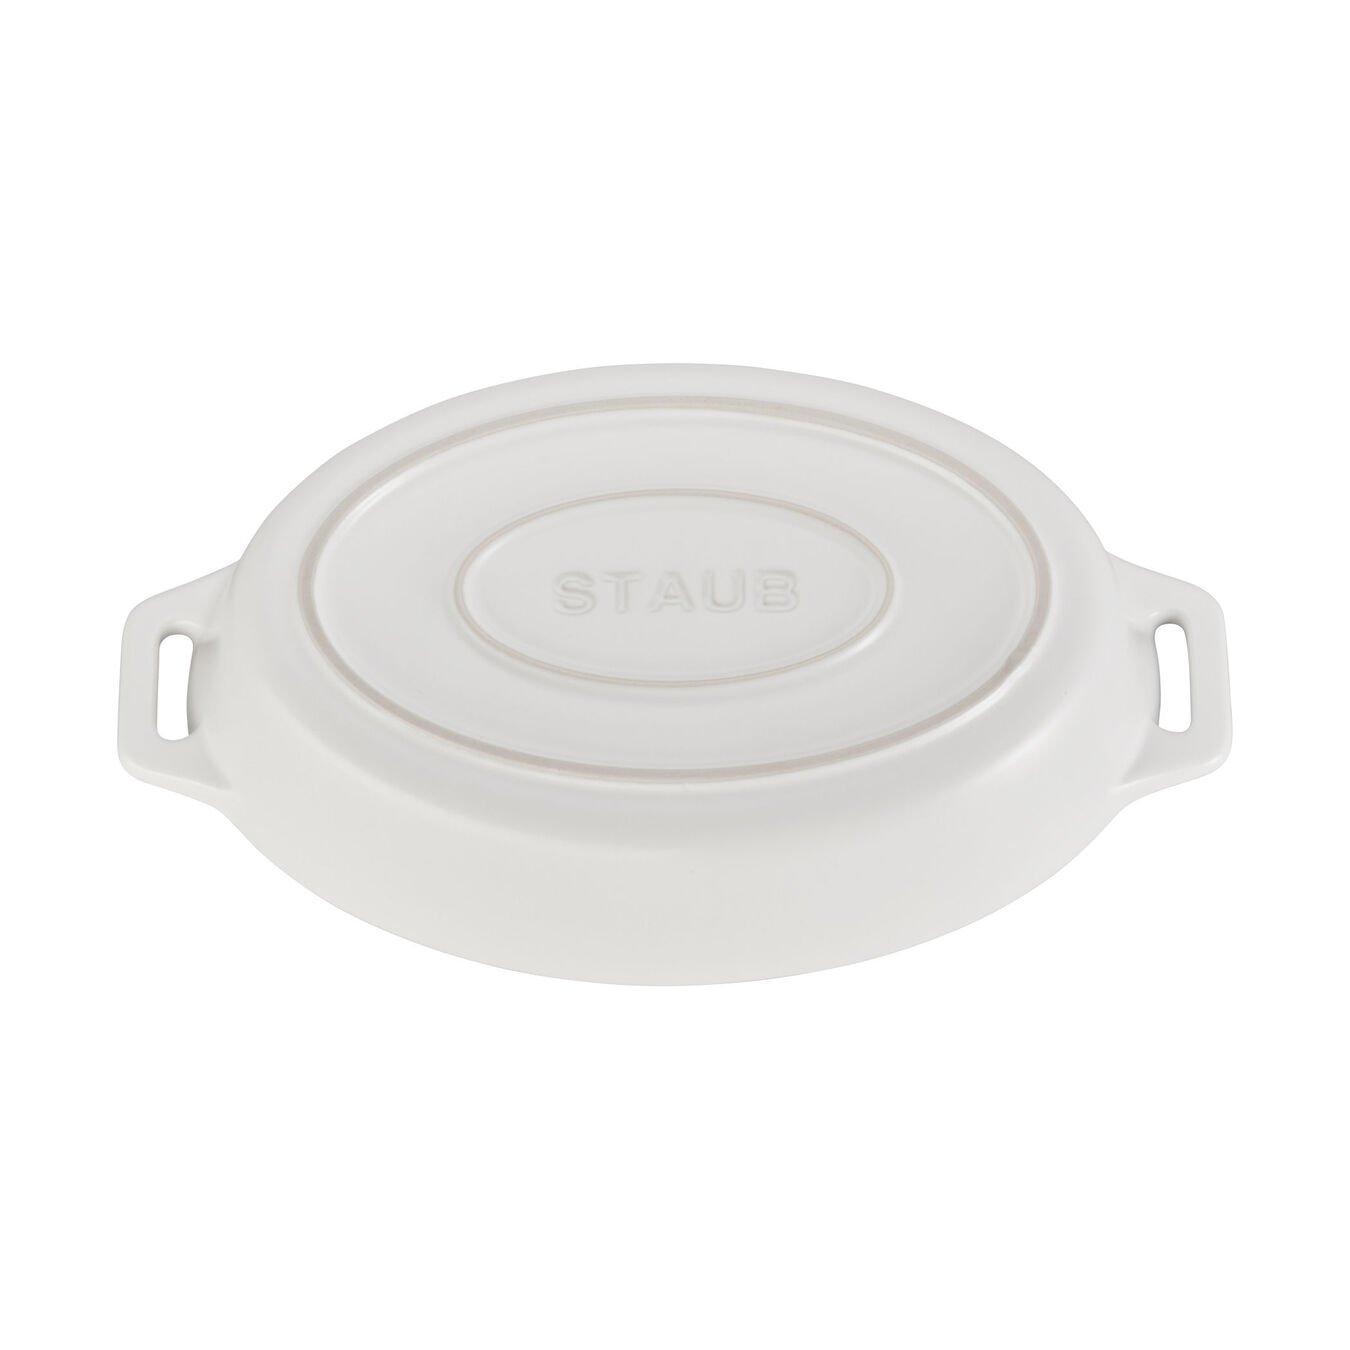 Ceramic oval Plat empilable, Matte-White,,large 3